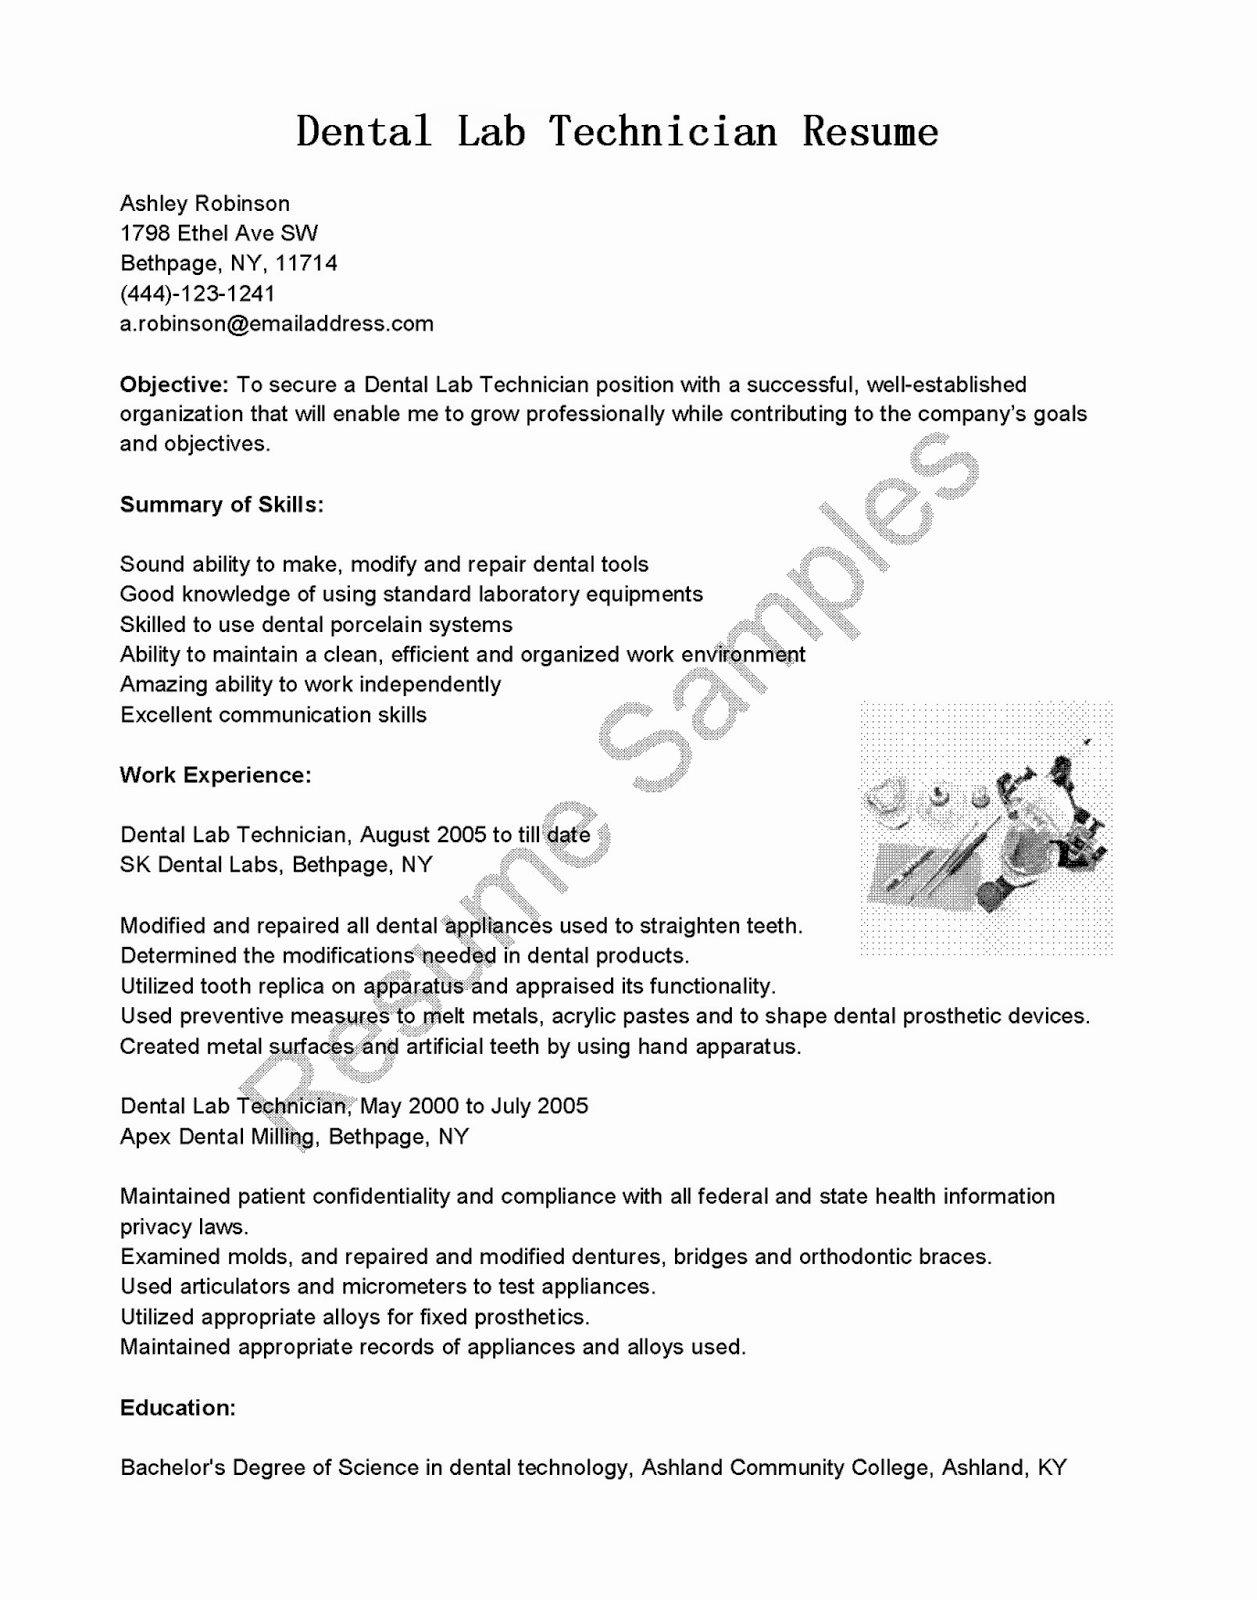 Resume Samples Dental Lab Technician Resume Sample